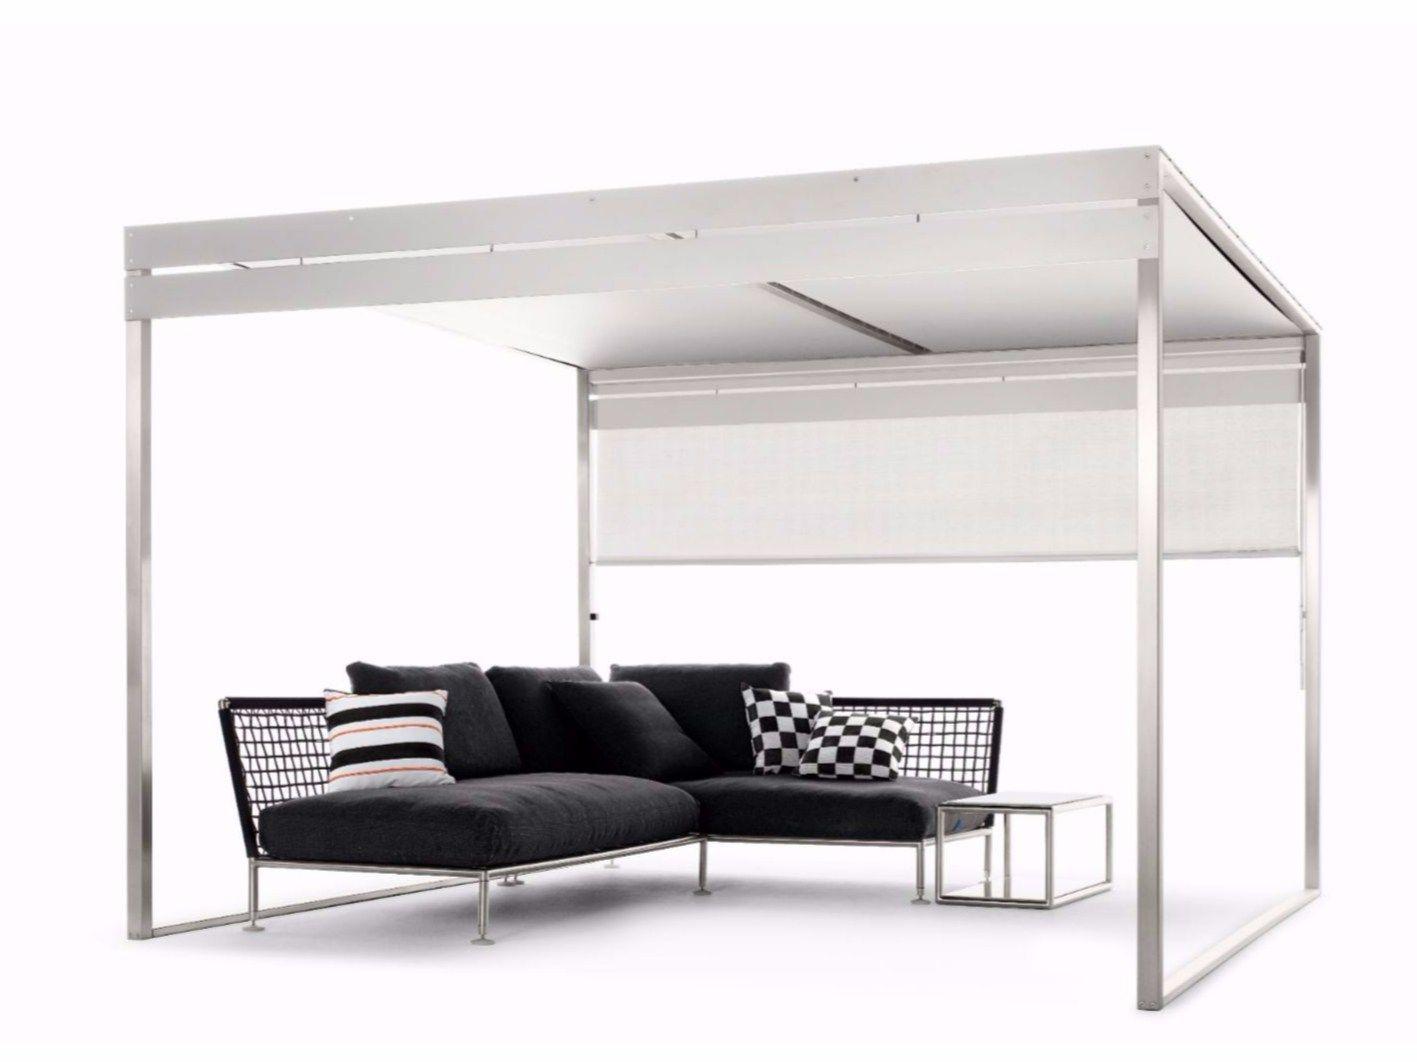 freistehende terrassen berdachung aus stahl pergola by. Black Bedroom Furniture Sets. Home Design Ideas